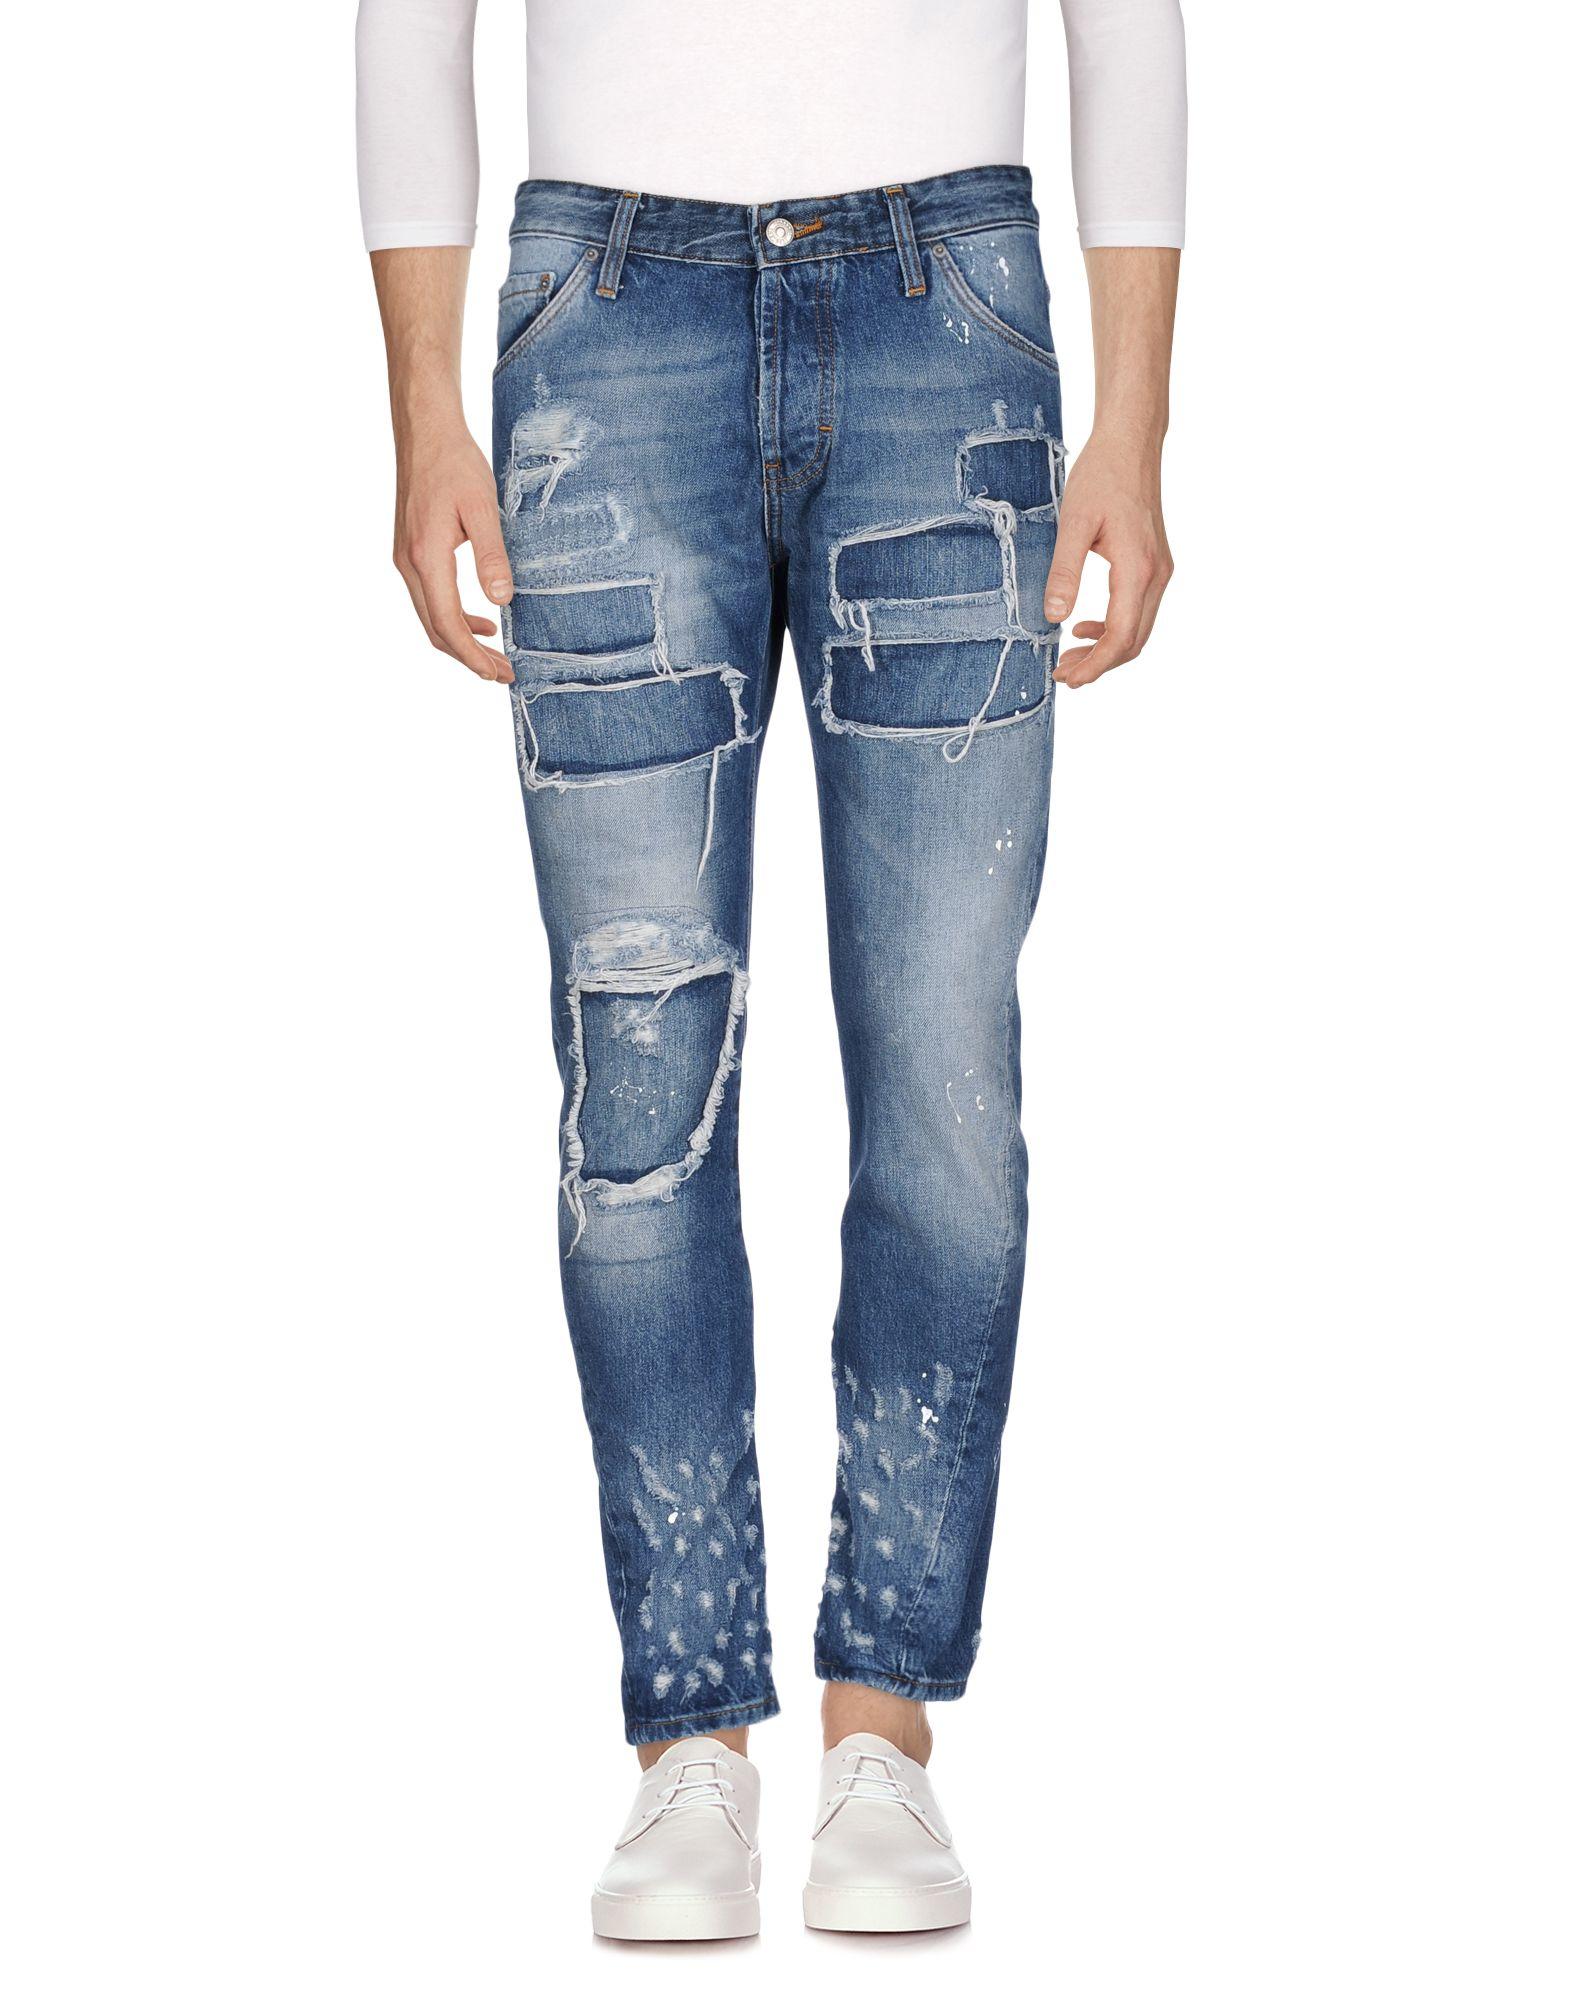 Pantaloni Jeans Takeshy Kurosawa Uomo - 42630372RM 42630372RM 42630372RM 046570